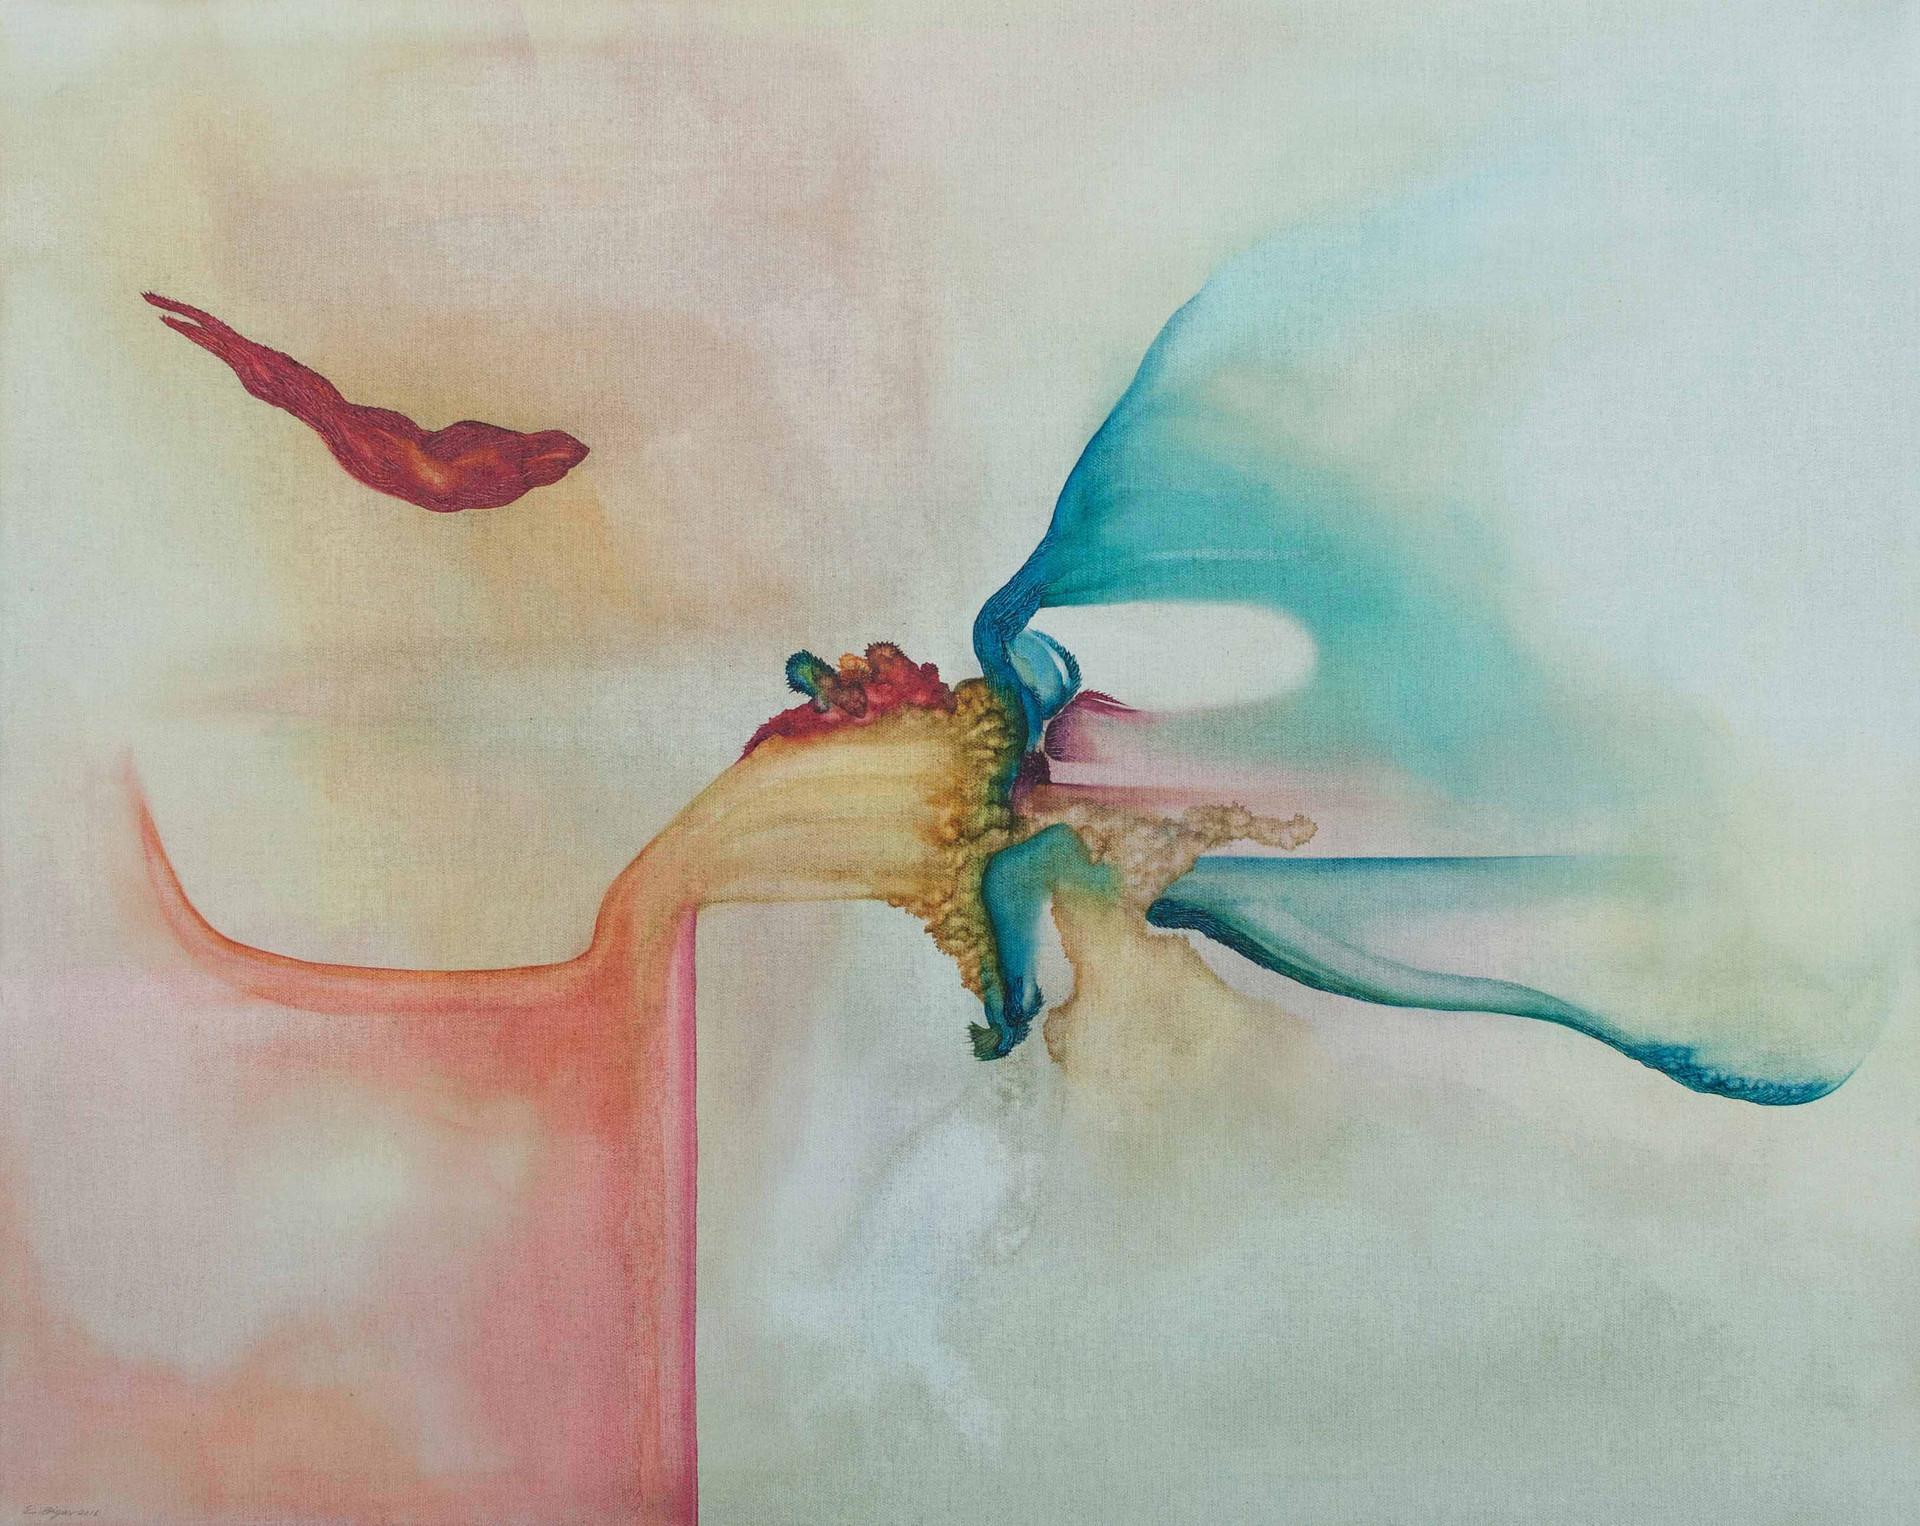 Tapiola 2016 100x80cm Oil on canvas